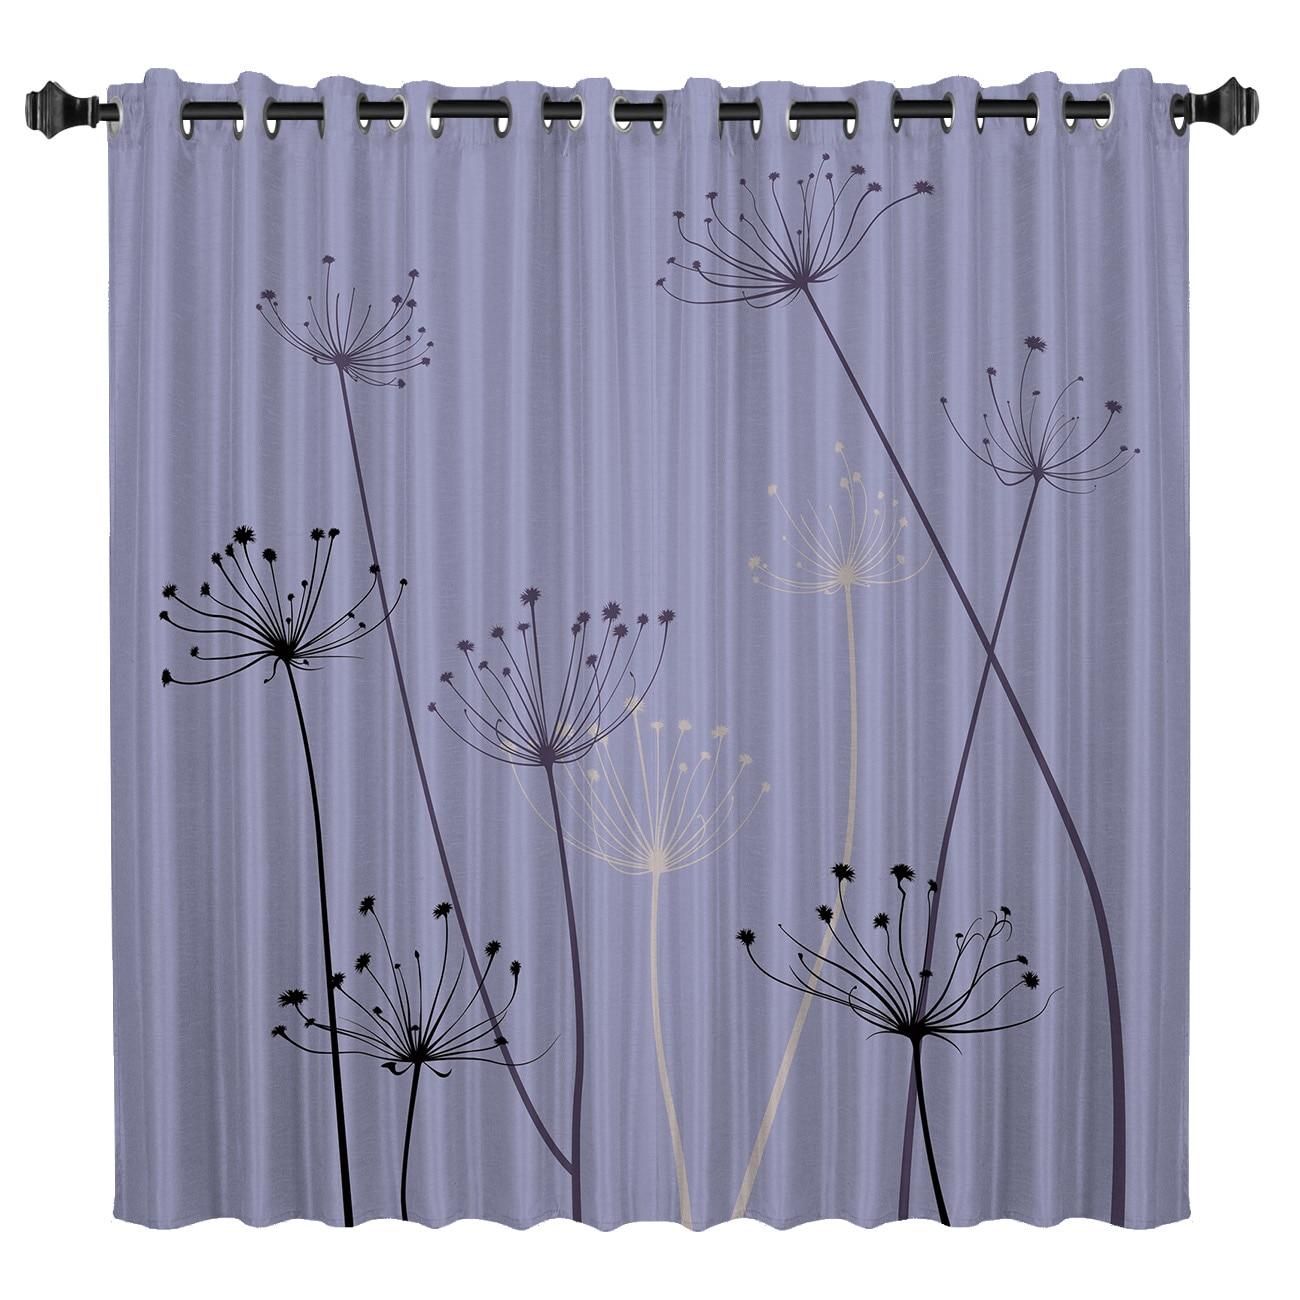 Purple Background Plant Window Curtains Dark Living Room Curtain Rod Bathroom Kitchen Outdoor Fabric Window Treatment Ideas